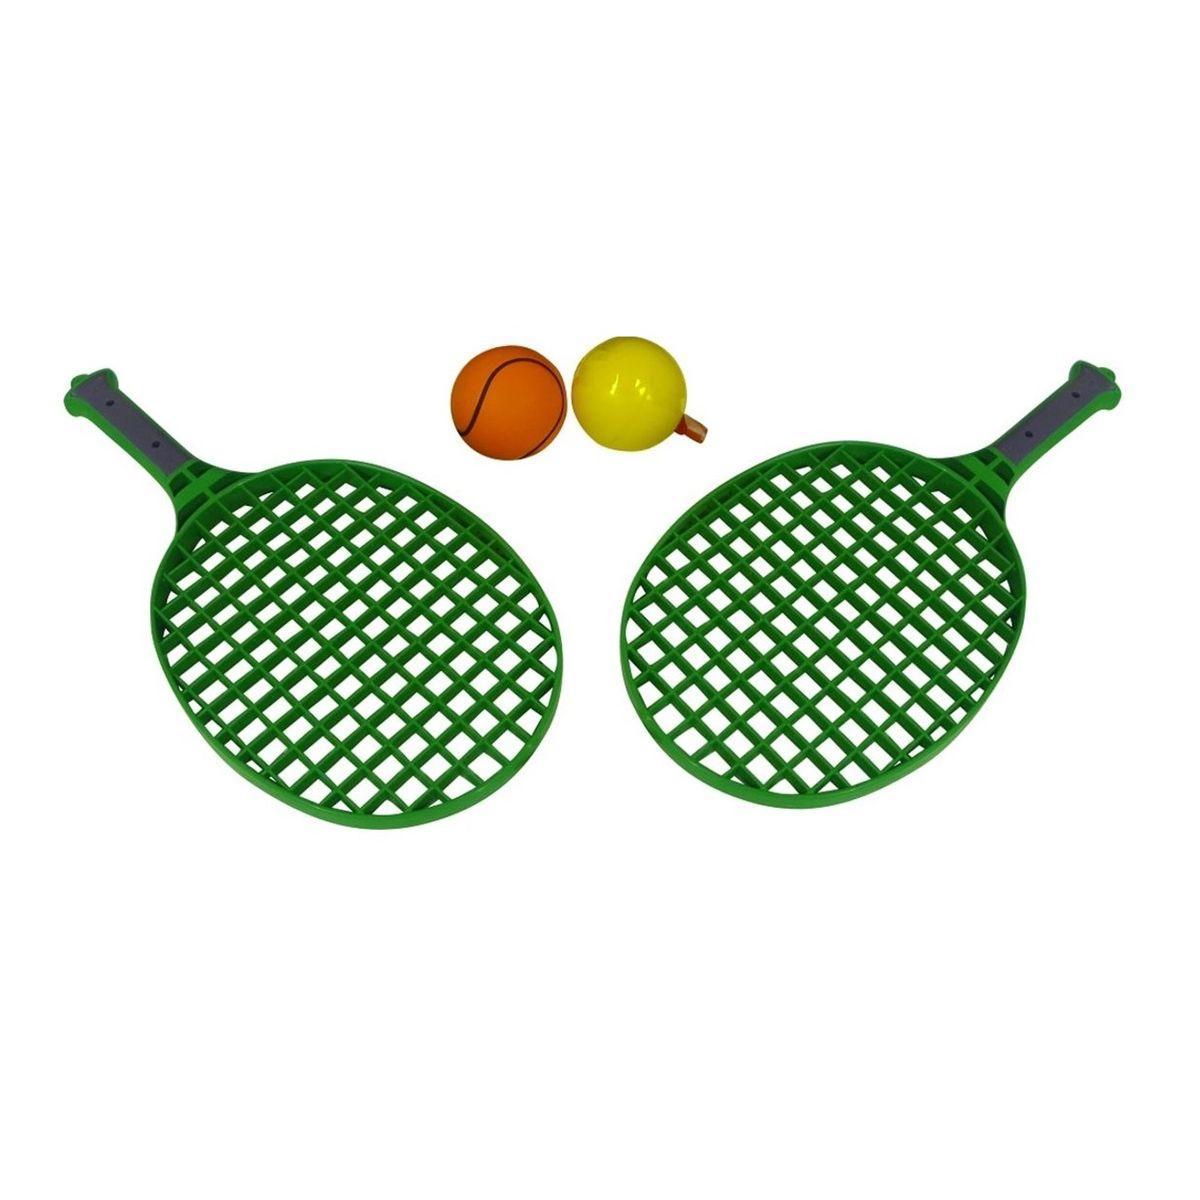 Kit Jogo de Tênis Portátil - Belfix - Jogos - Magazine Luiza bf03e137696aa